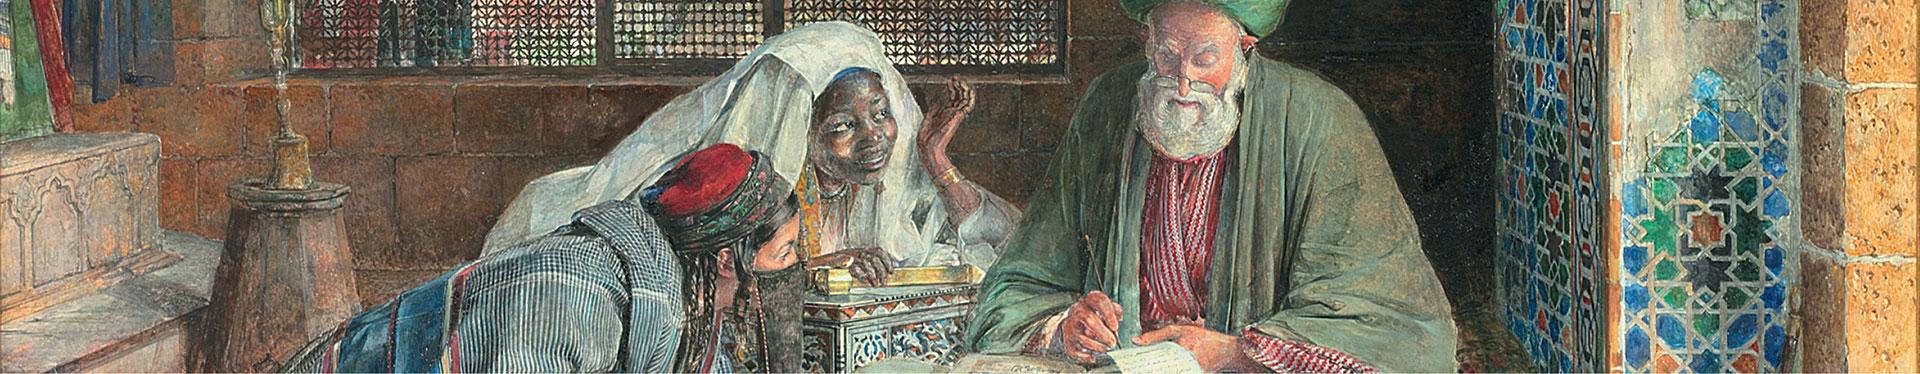 orientalist-art-banner-FINAL_105_1_20170104115429.jpg